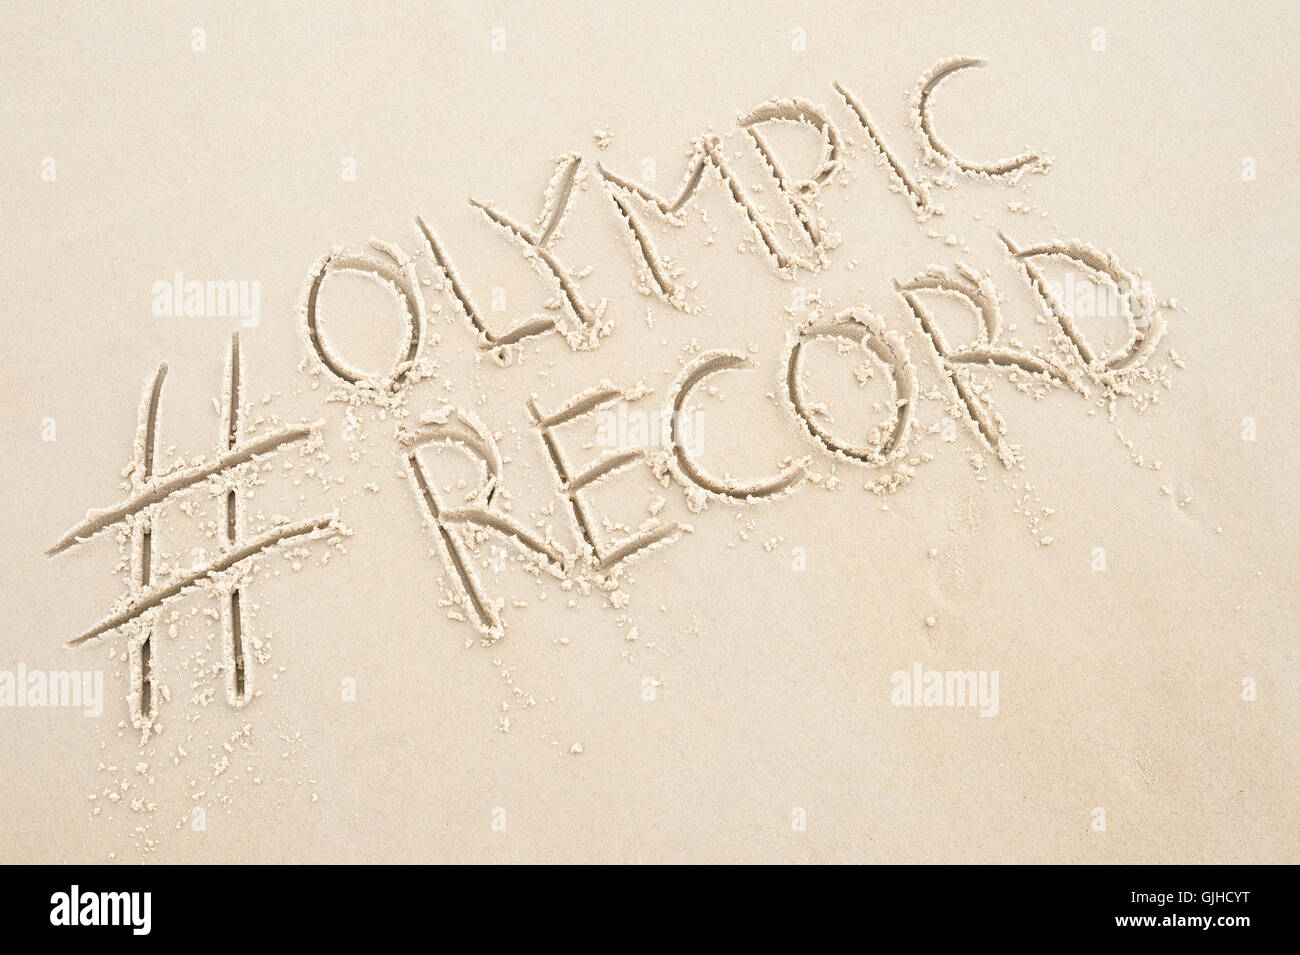 RIO DE JANEIRO - APRIL 4, 2016: Handwritten hashtag Olympic Record social media message handwritten in clean text - Stock Image